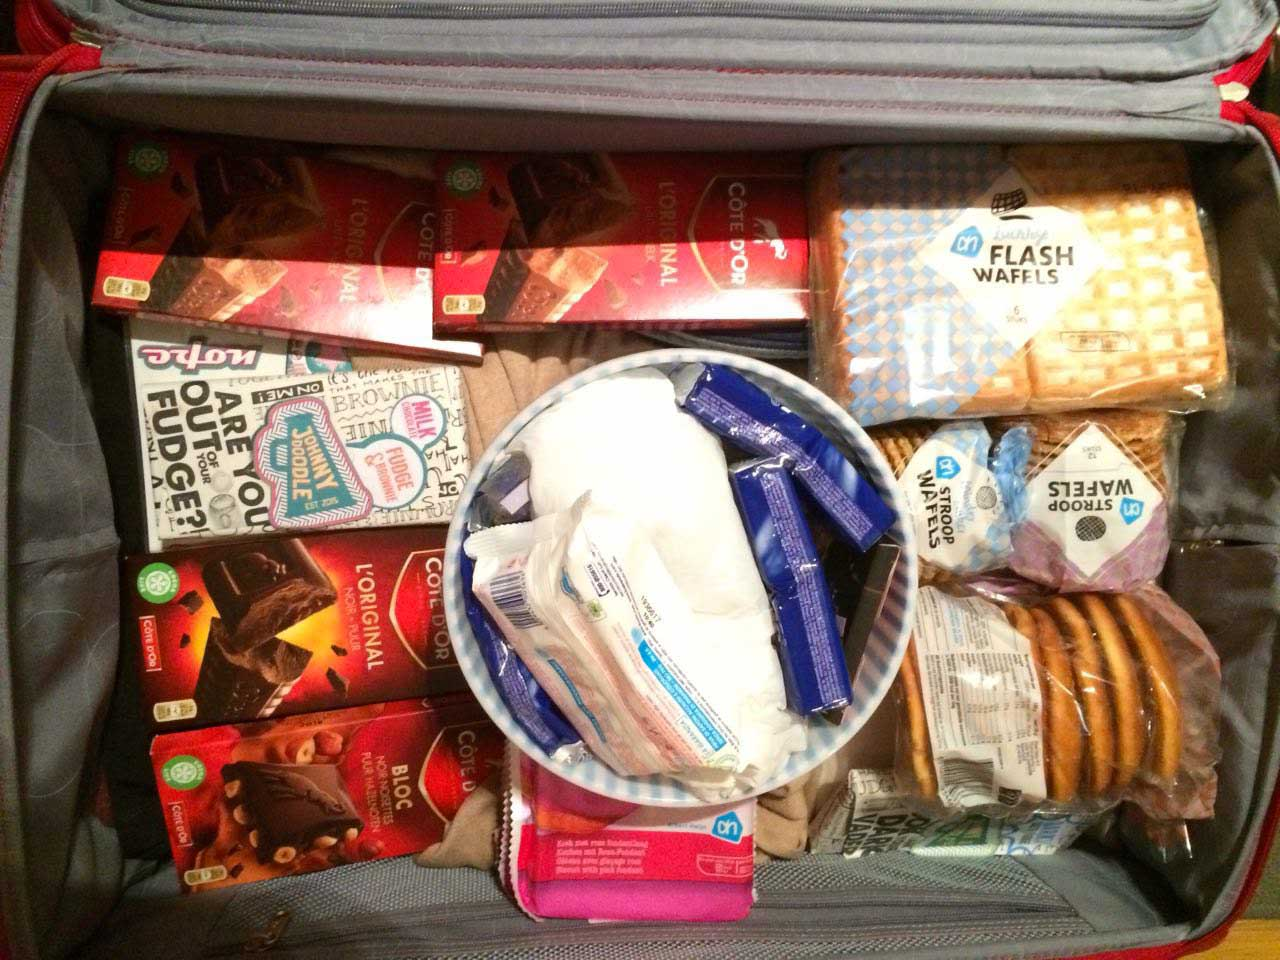 valigia piena di dolci